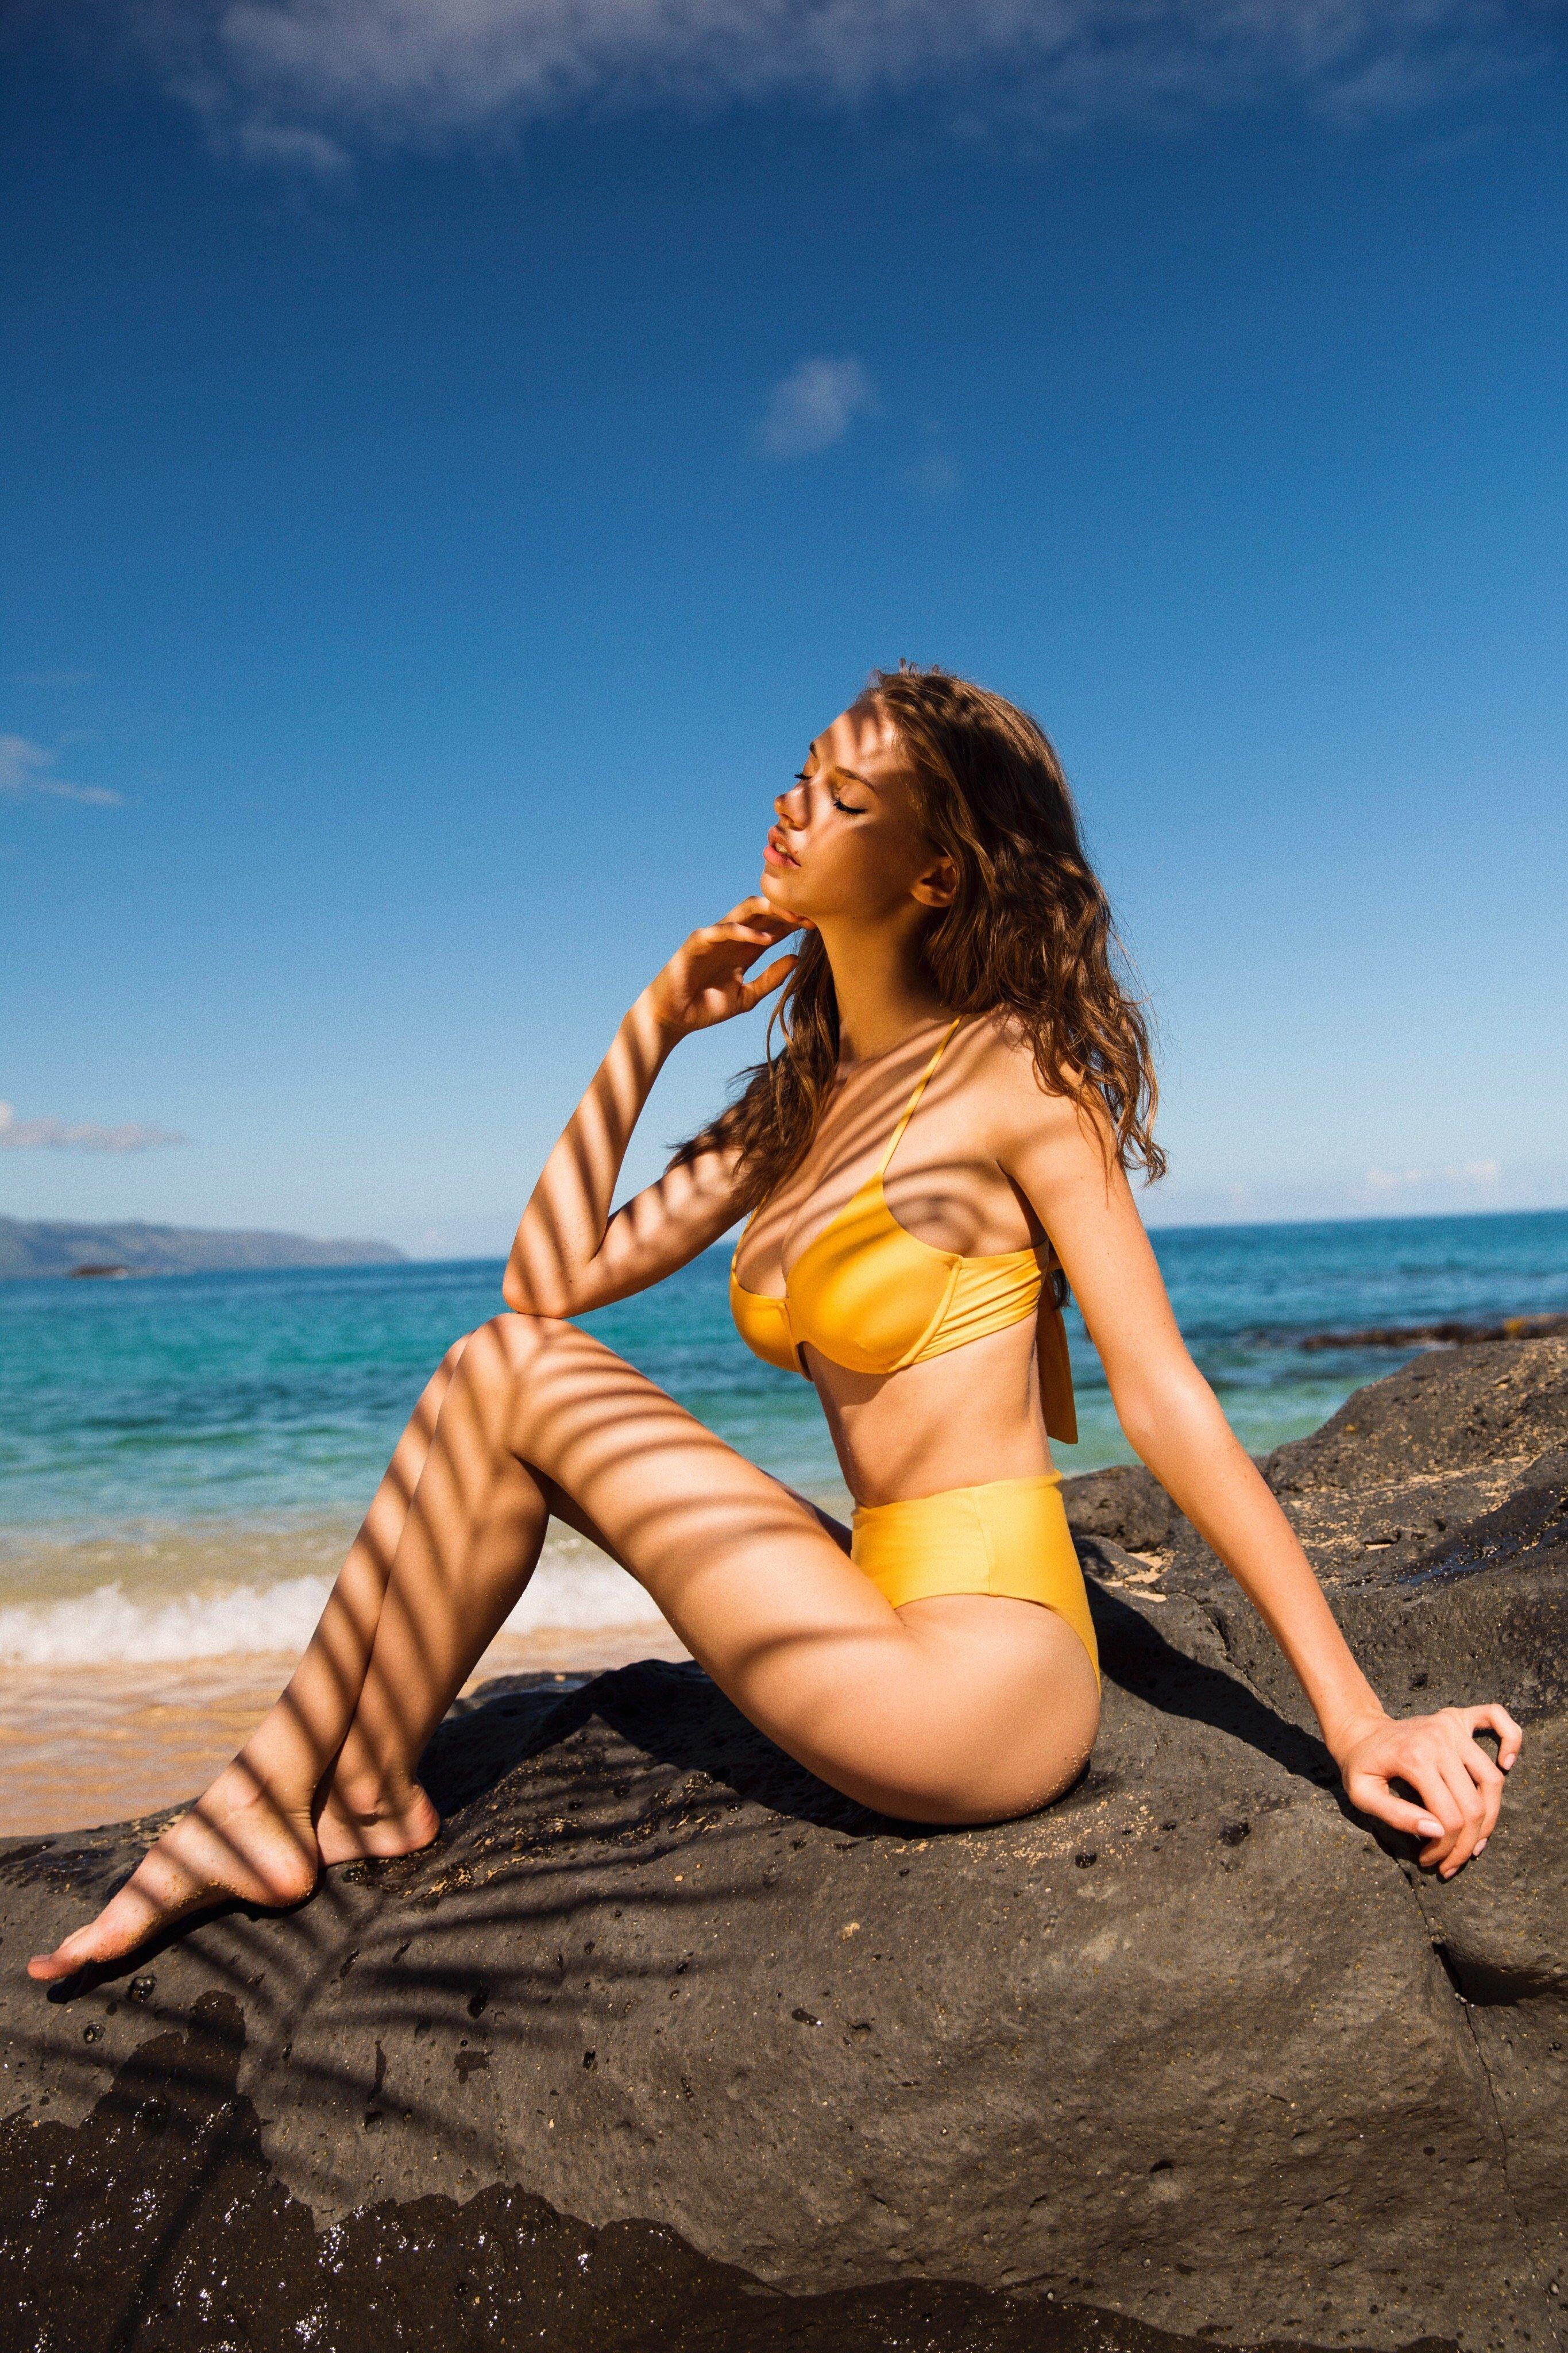 Bikini Yulia Rose nude (49 foto and video), Sexy, Hot, Feet, butt 2017